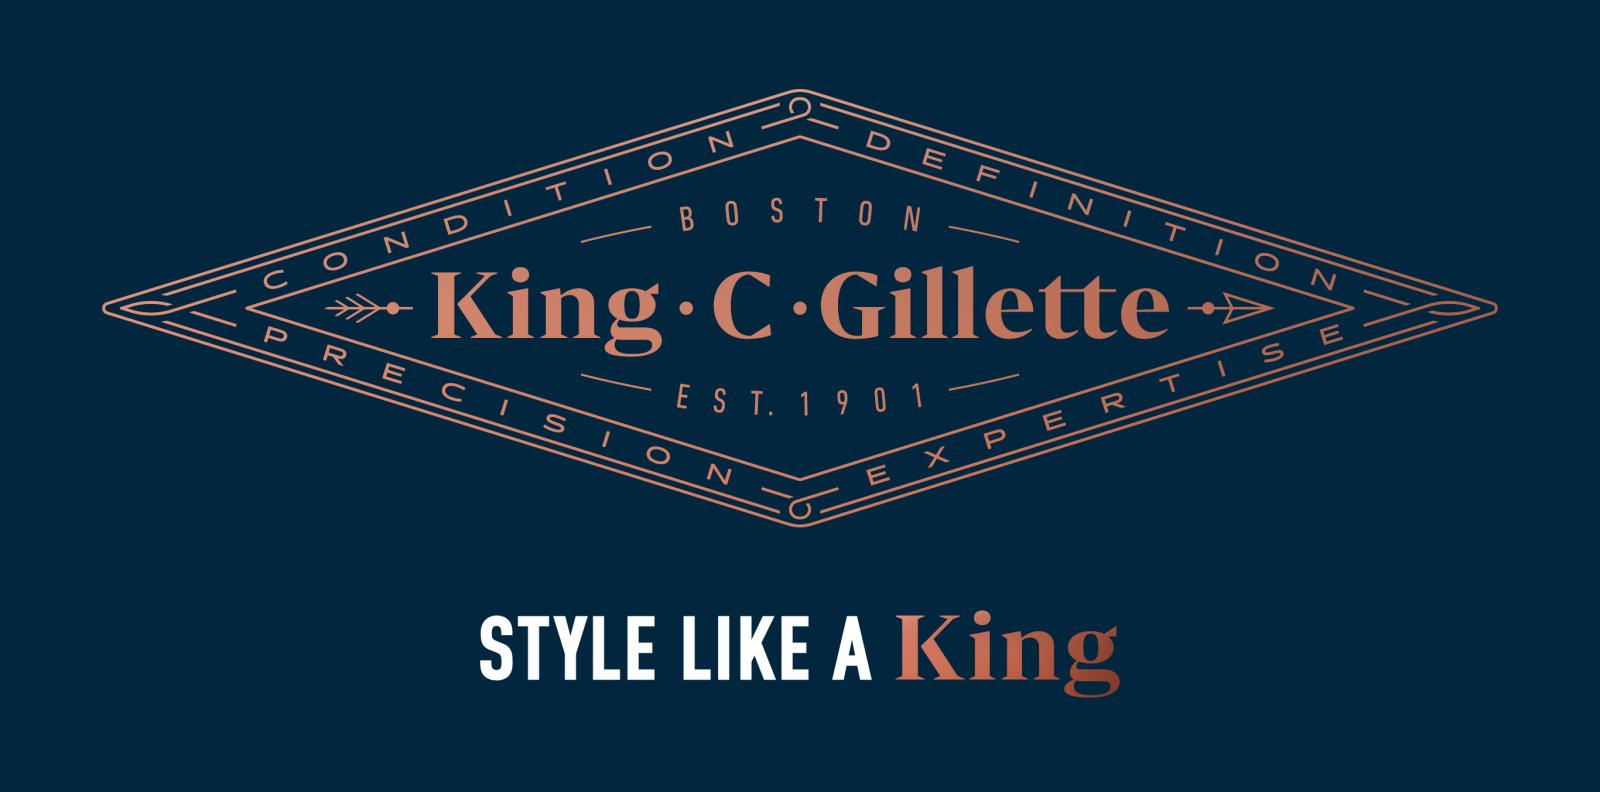 Linea King C. Gillette